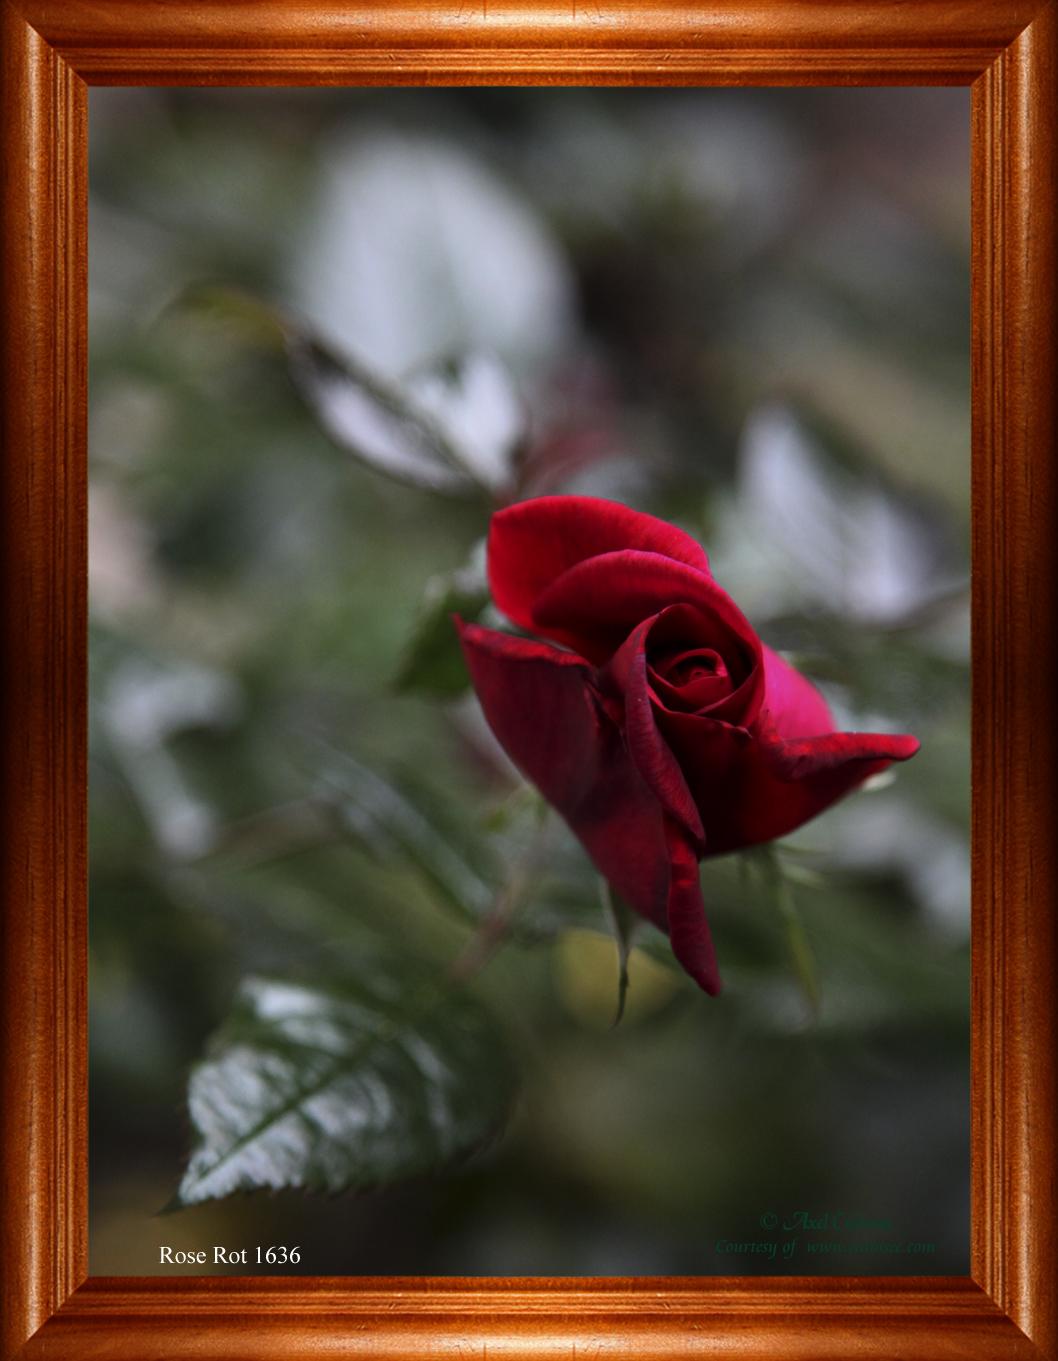 Rose Rot 1636